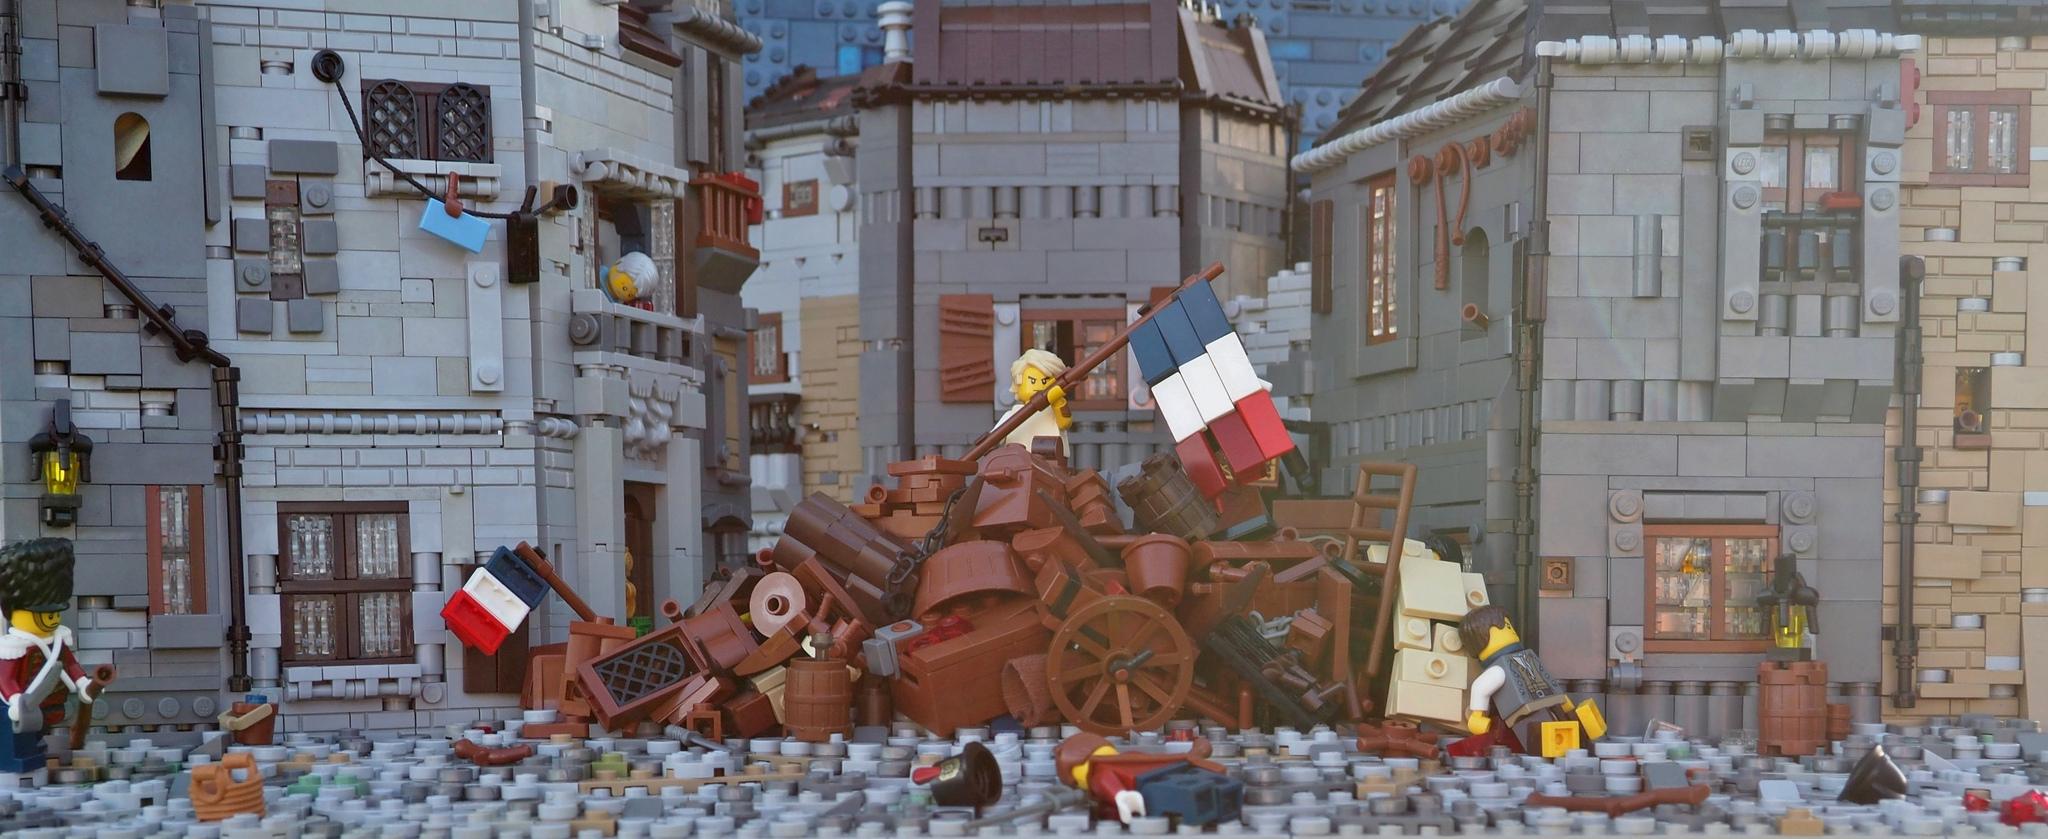 LEGO Les MIs